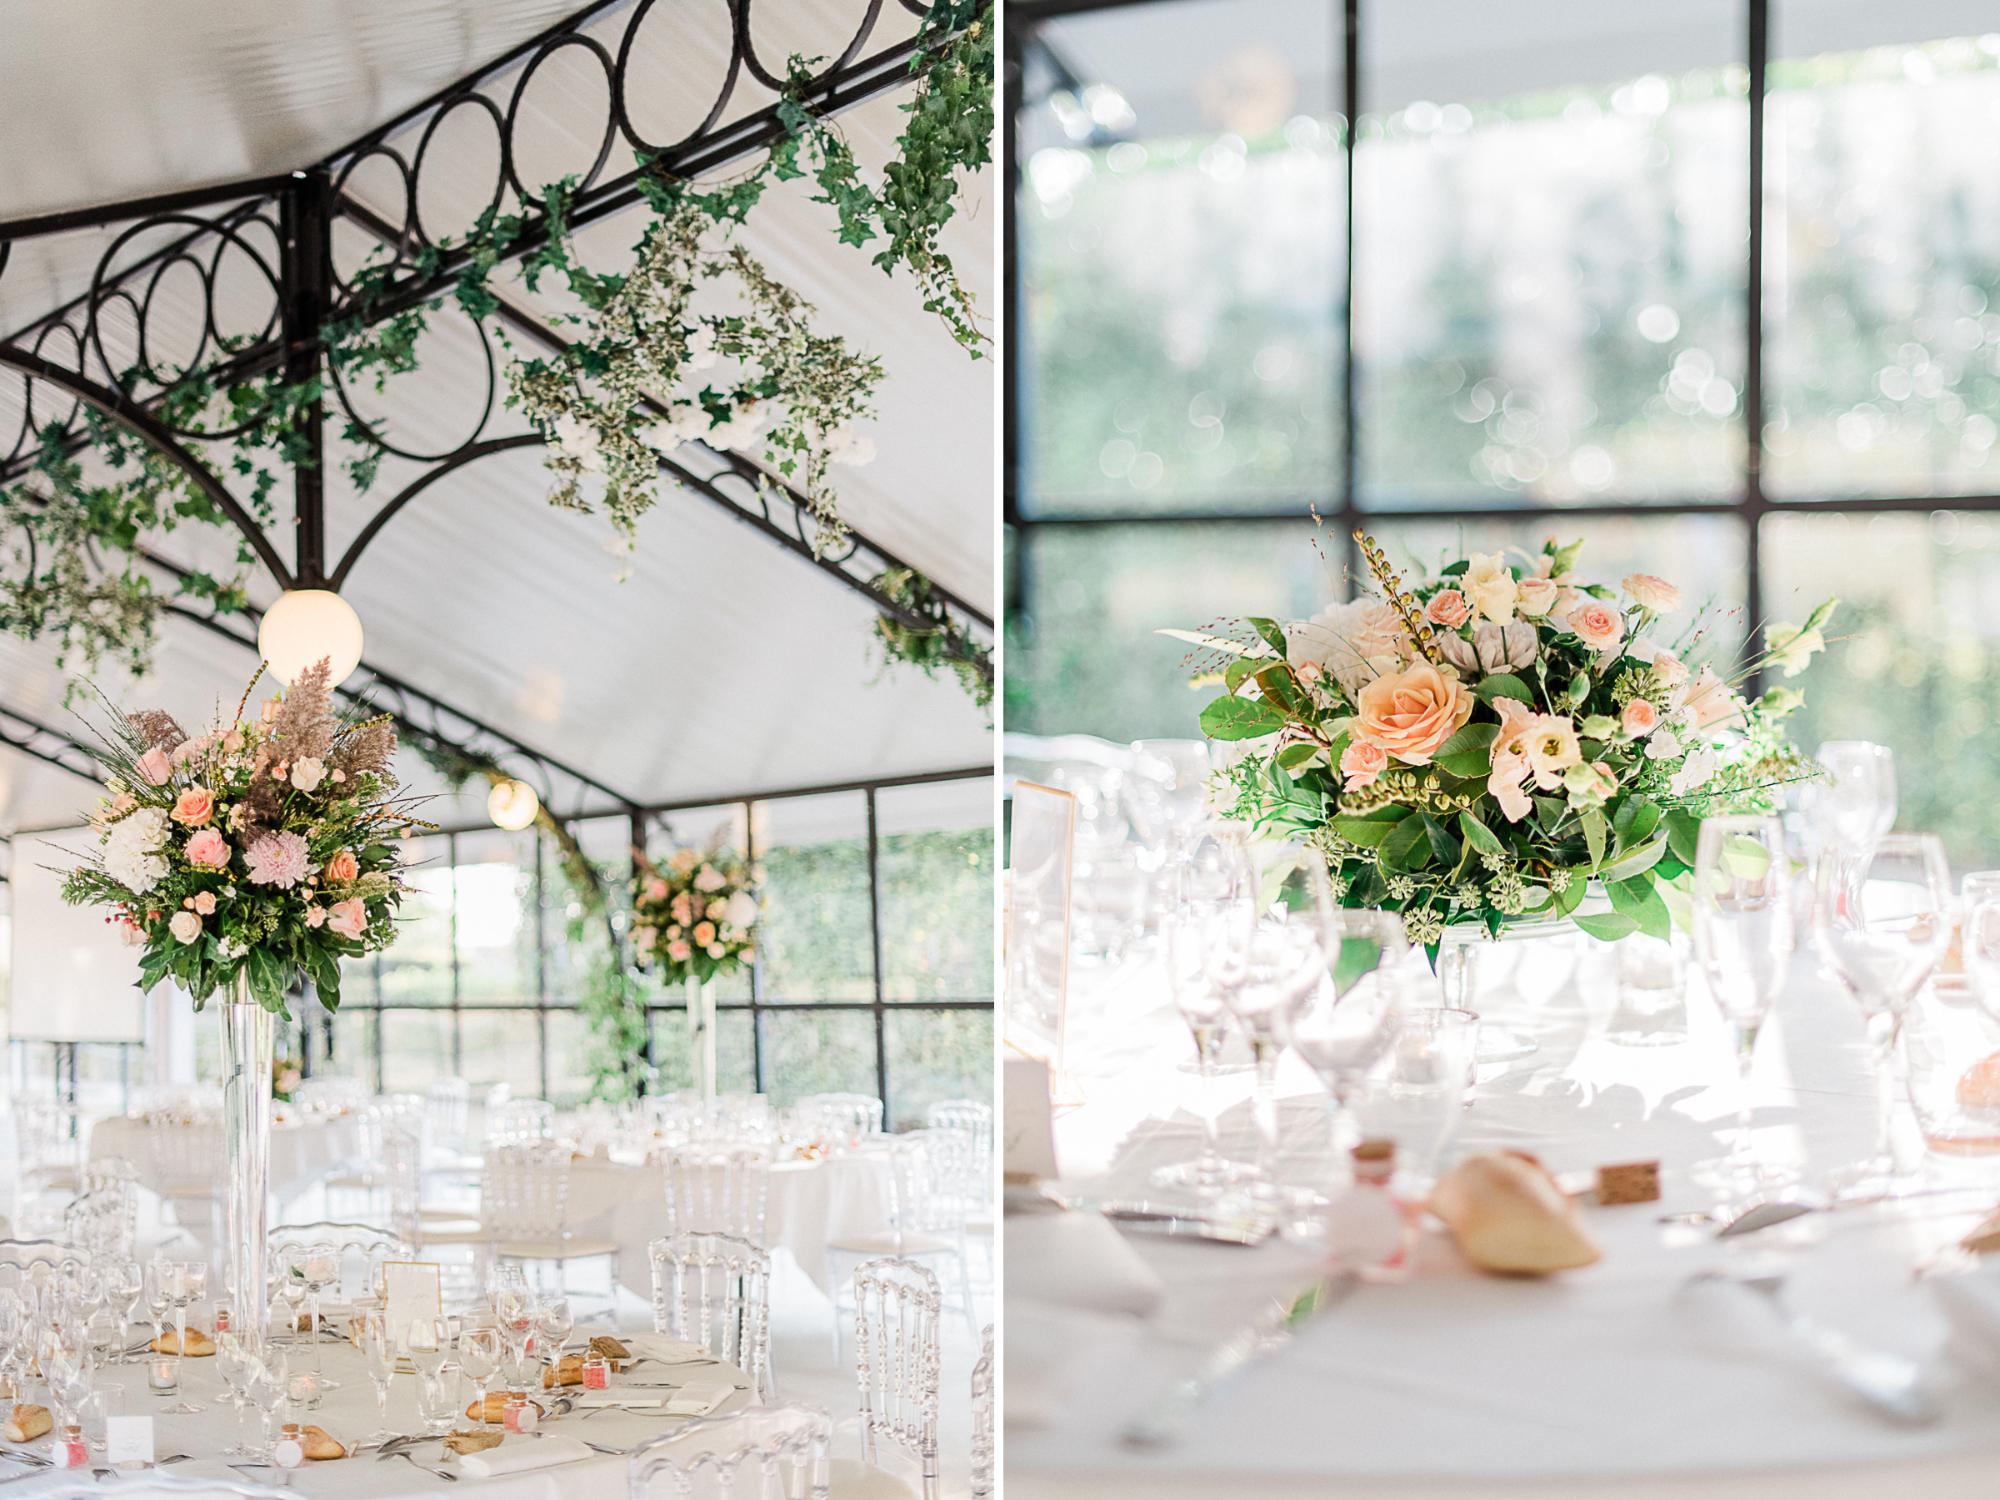 priscillapuzenat-photographe-mariage-bazoches-chateau-nievre-morvan-bourgogne-decoration-salle